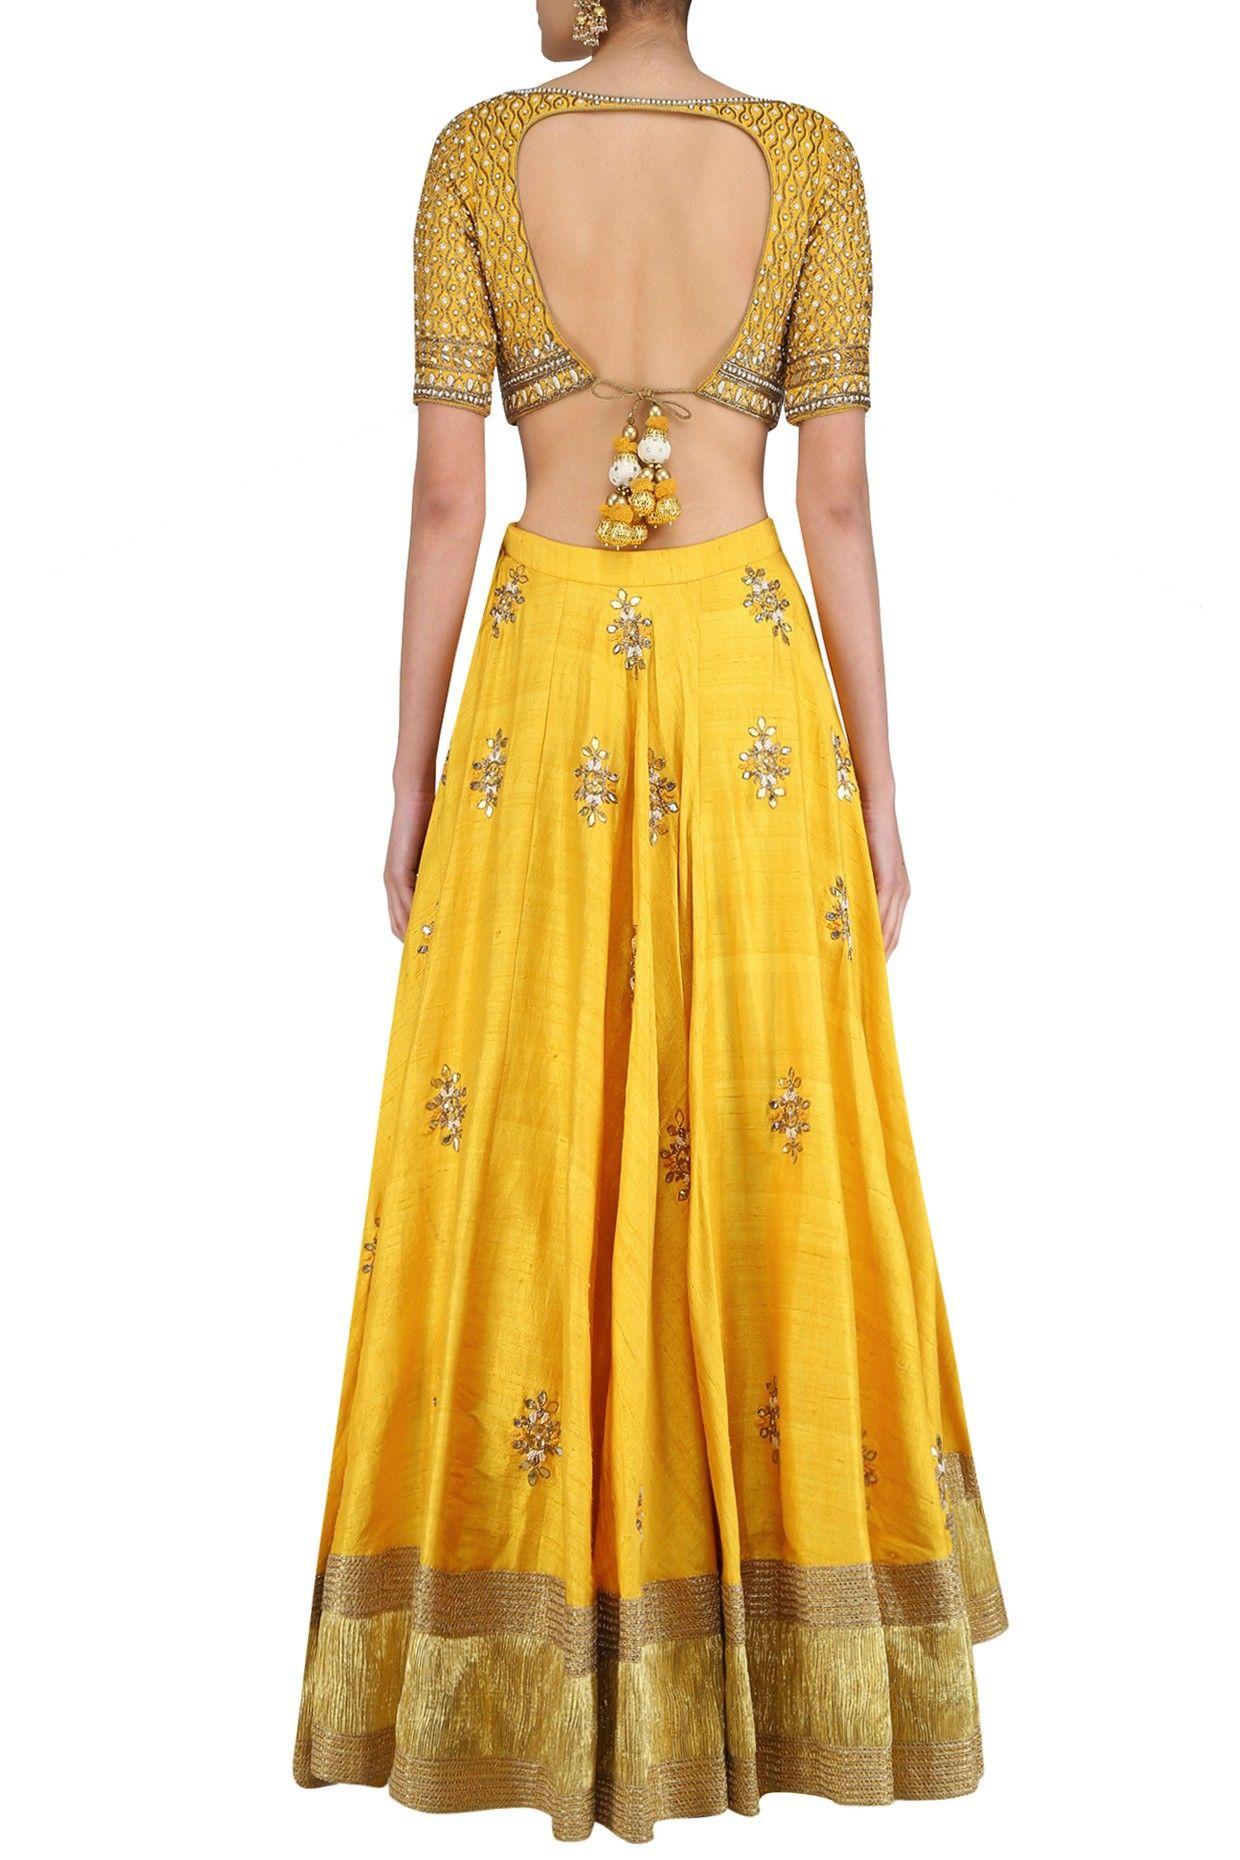 Off white gota patti embroidered blouse and yellow lehenga set